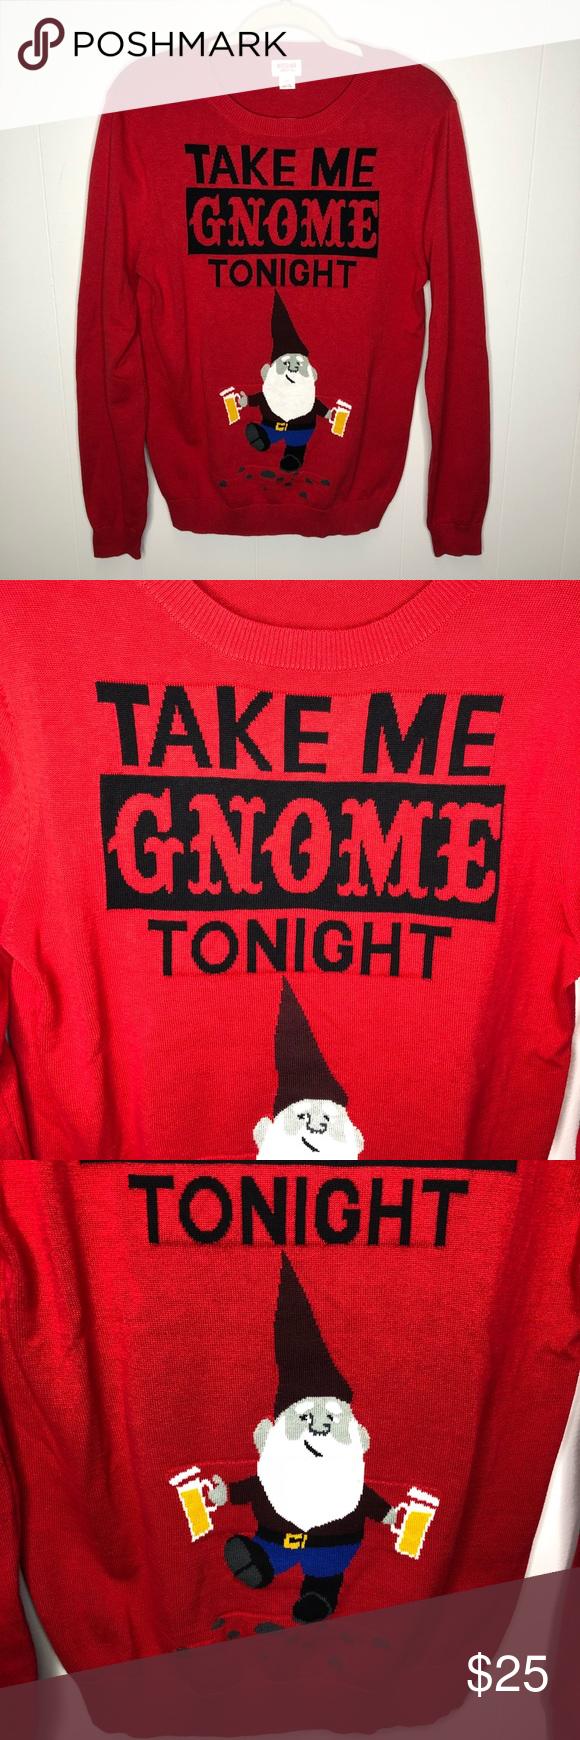 Take Me Gnome Tonight Red Christmas Sweater In 2018 My Posh Closet